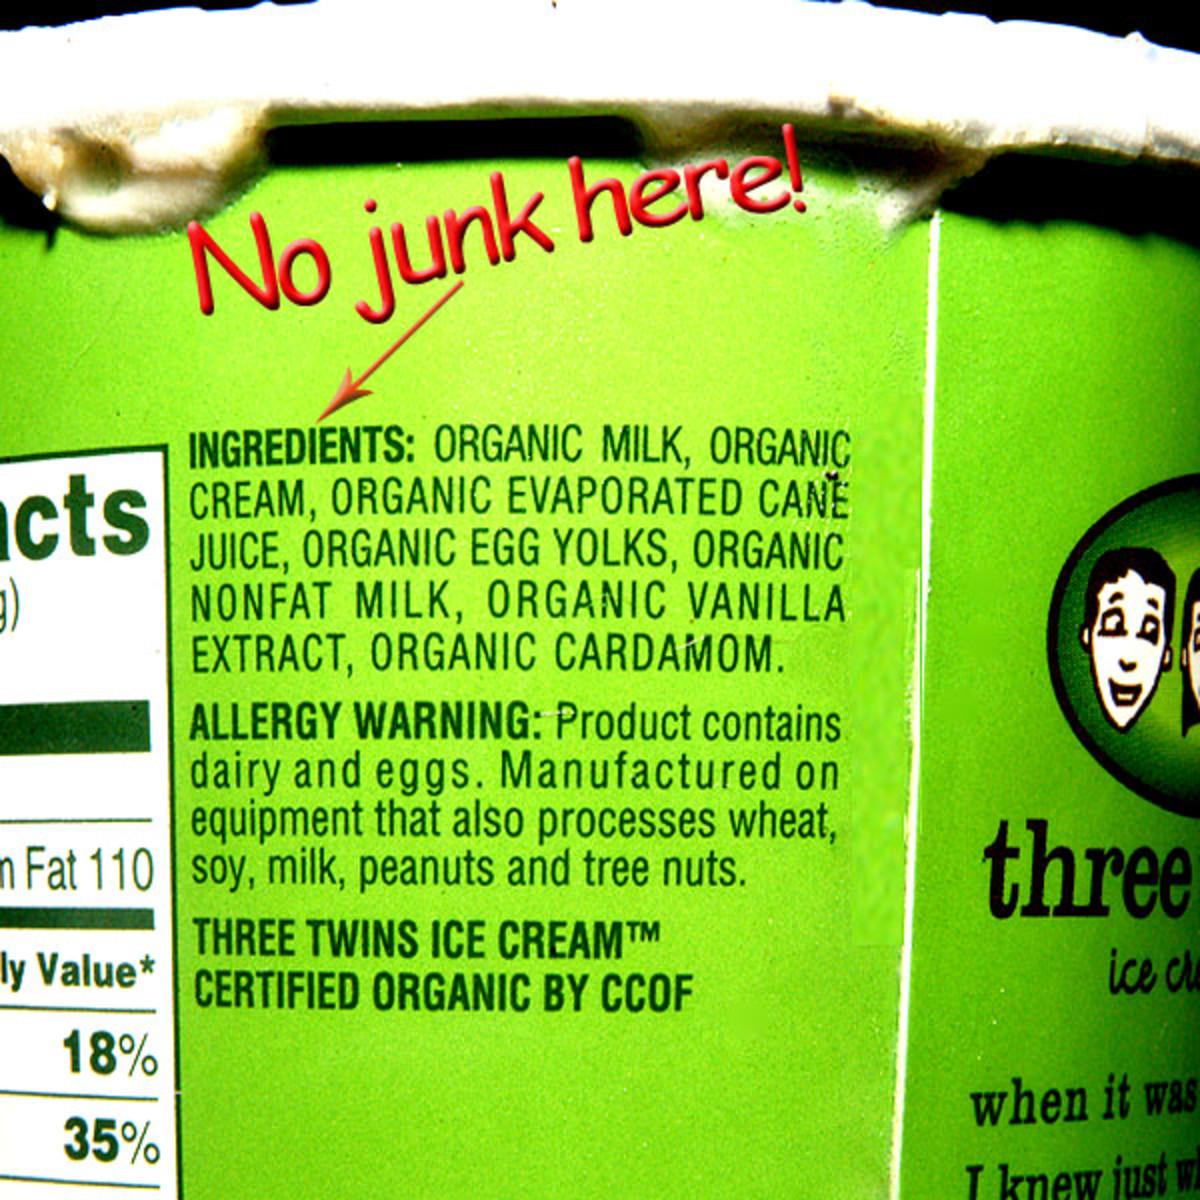 Three Twins Ice Cream™ Organic Ingredients Label